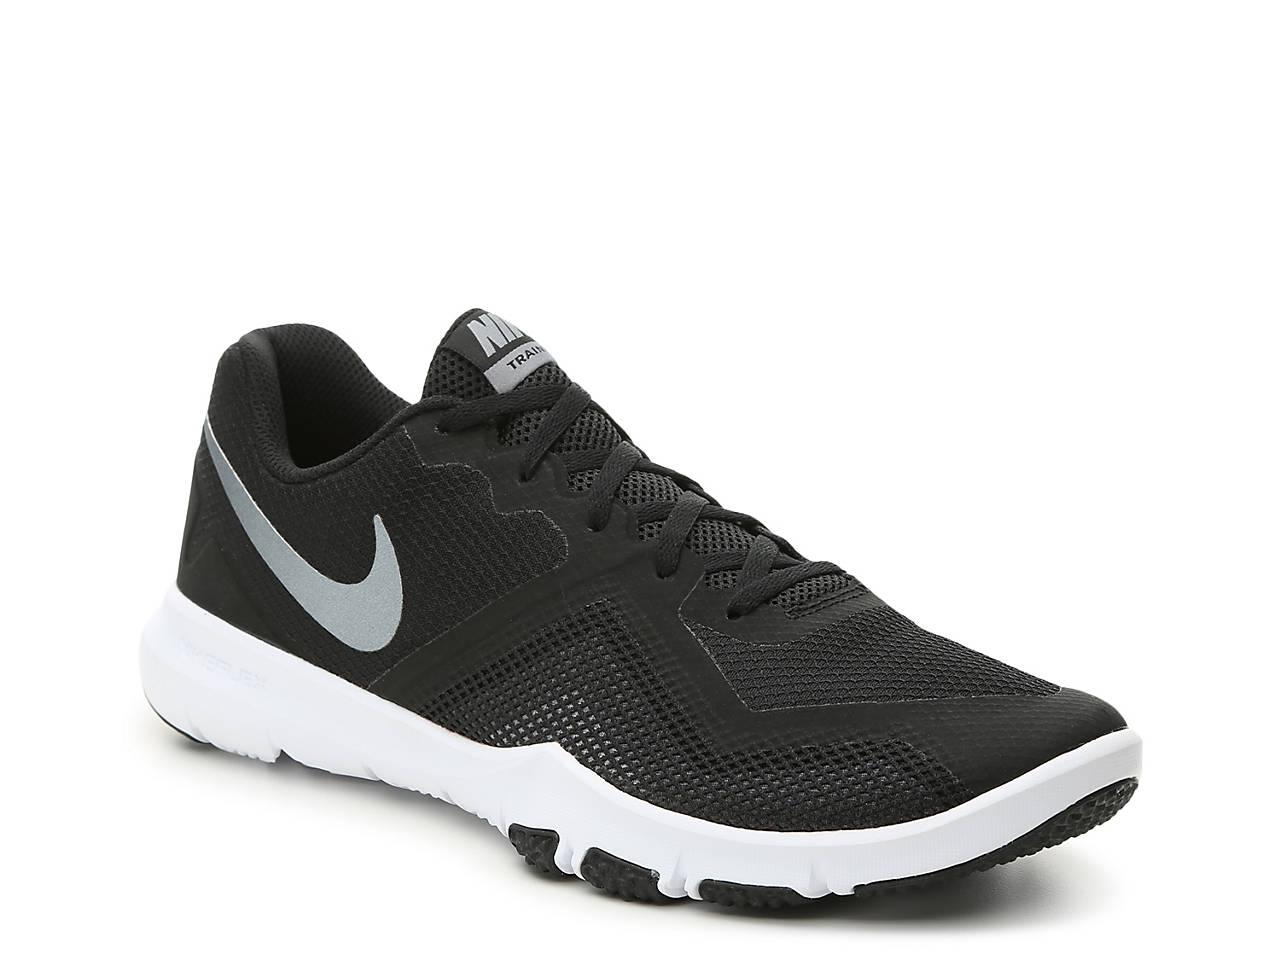 bcdb09468189f2 Nike Flex Control II Training Shoe - Men s Men s Shoes